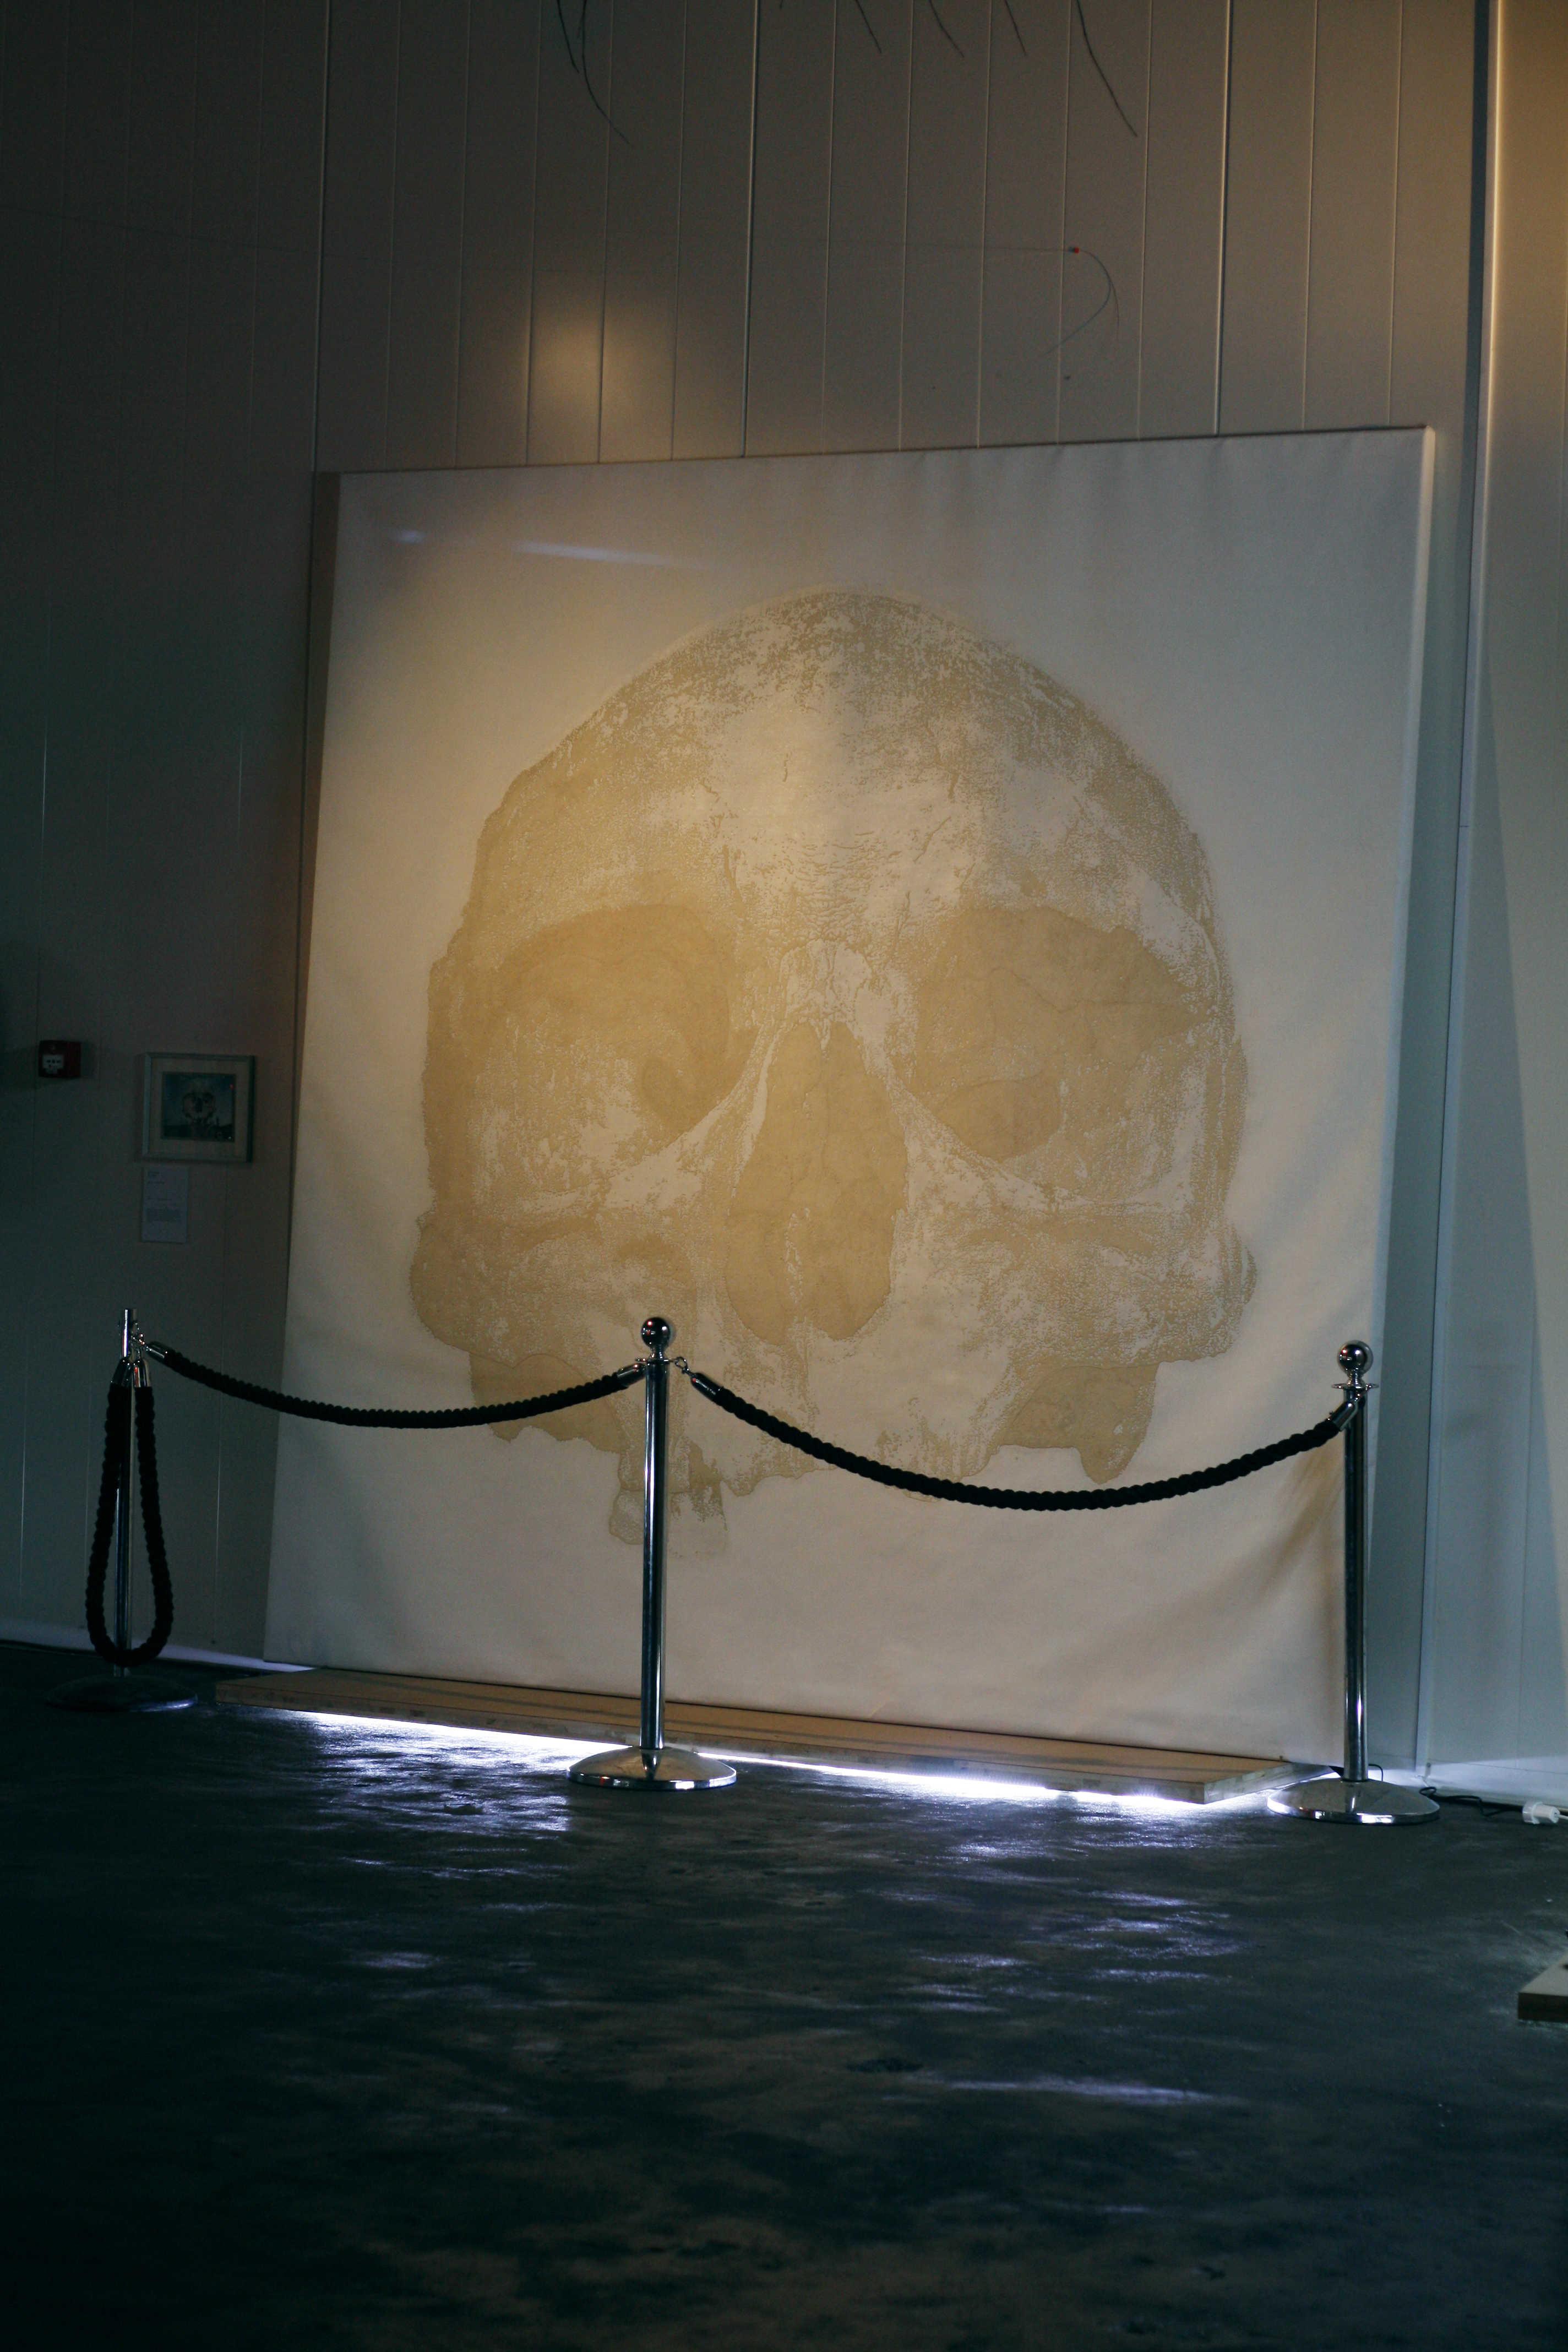 12a5be87c9 Faceless exhibition overview - work by Heiko Bressnik Bodil Schermerhorn